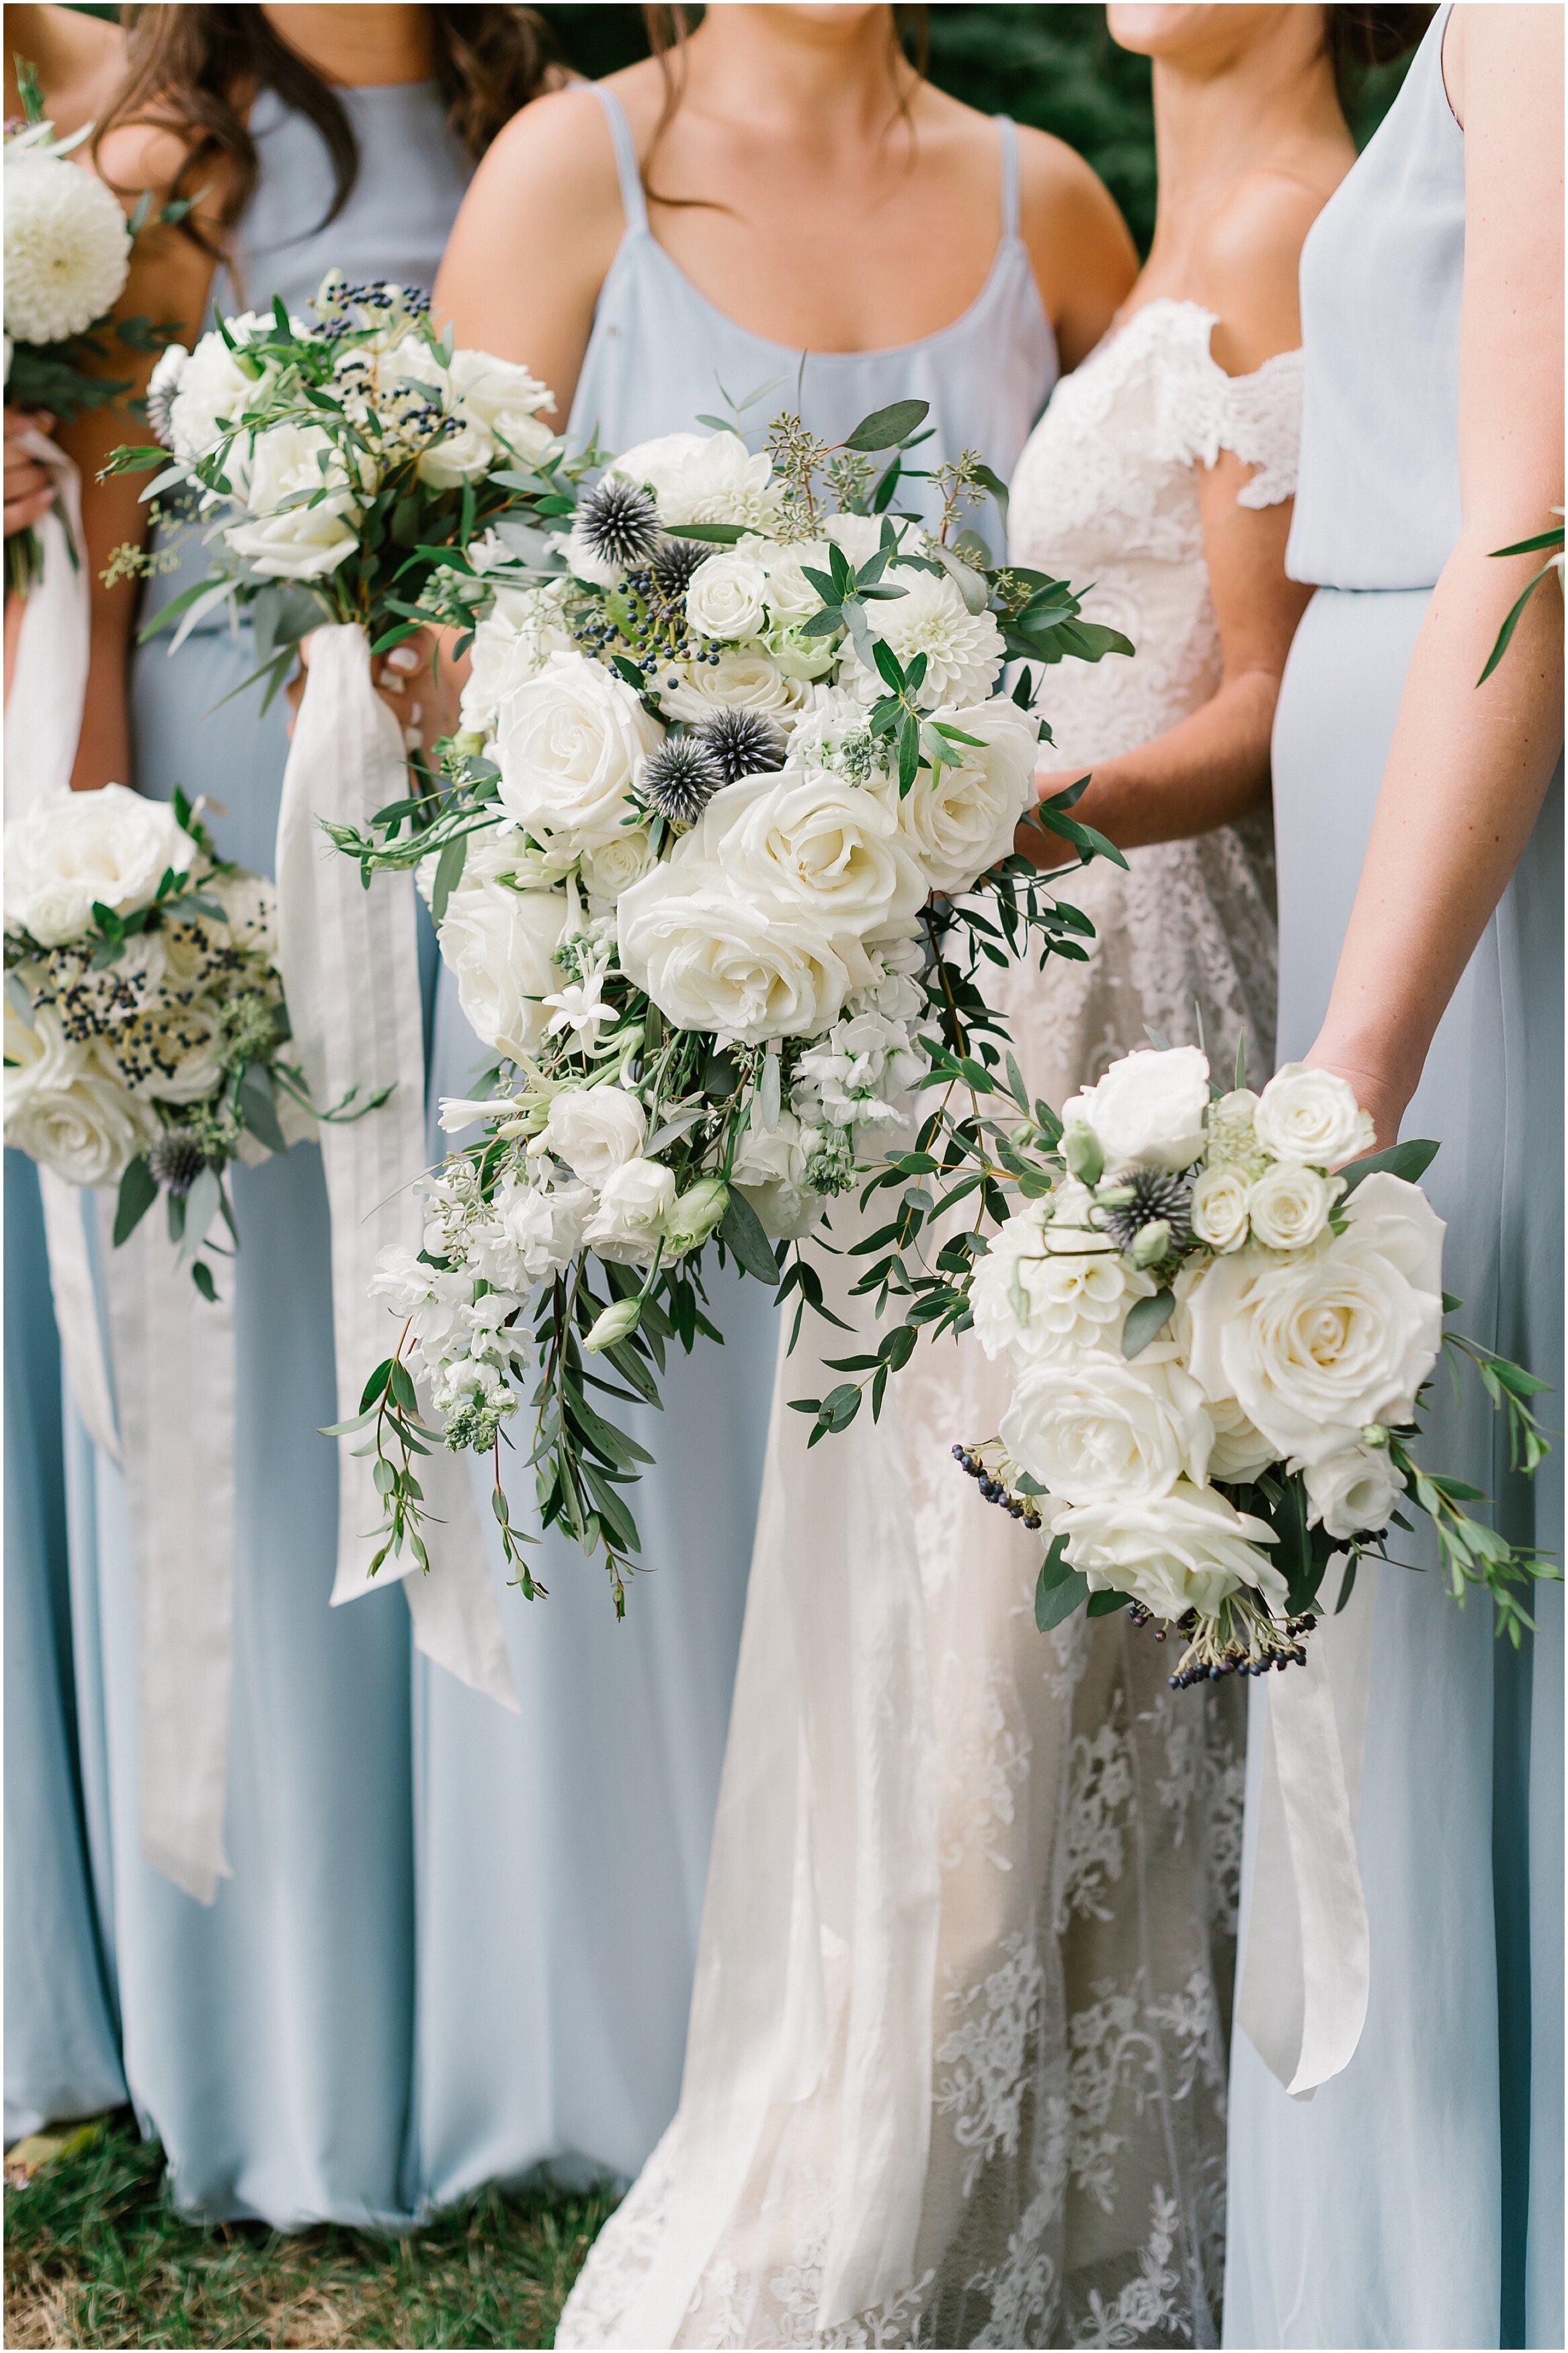 Rebecca Shehorn Photography Indianapolis Wedding Photographer Sycamore at Mallow Run_0721.jpg